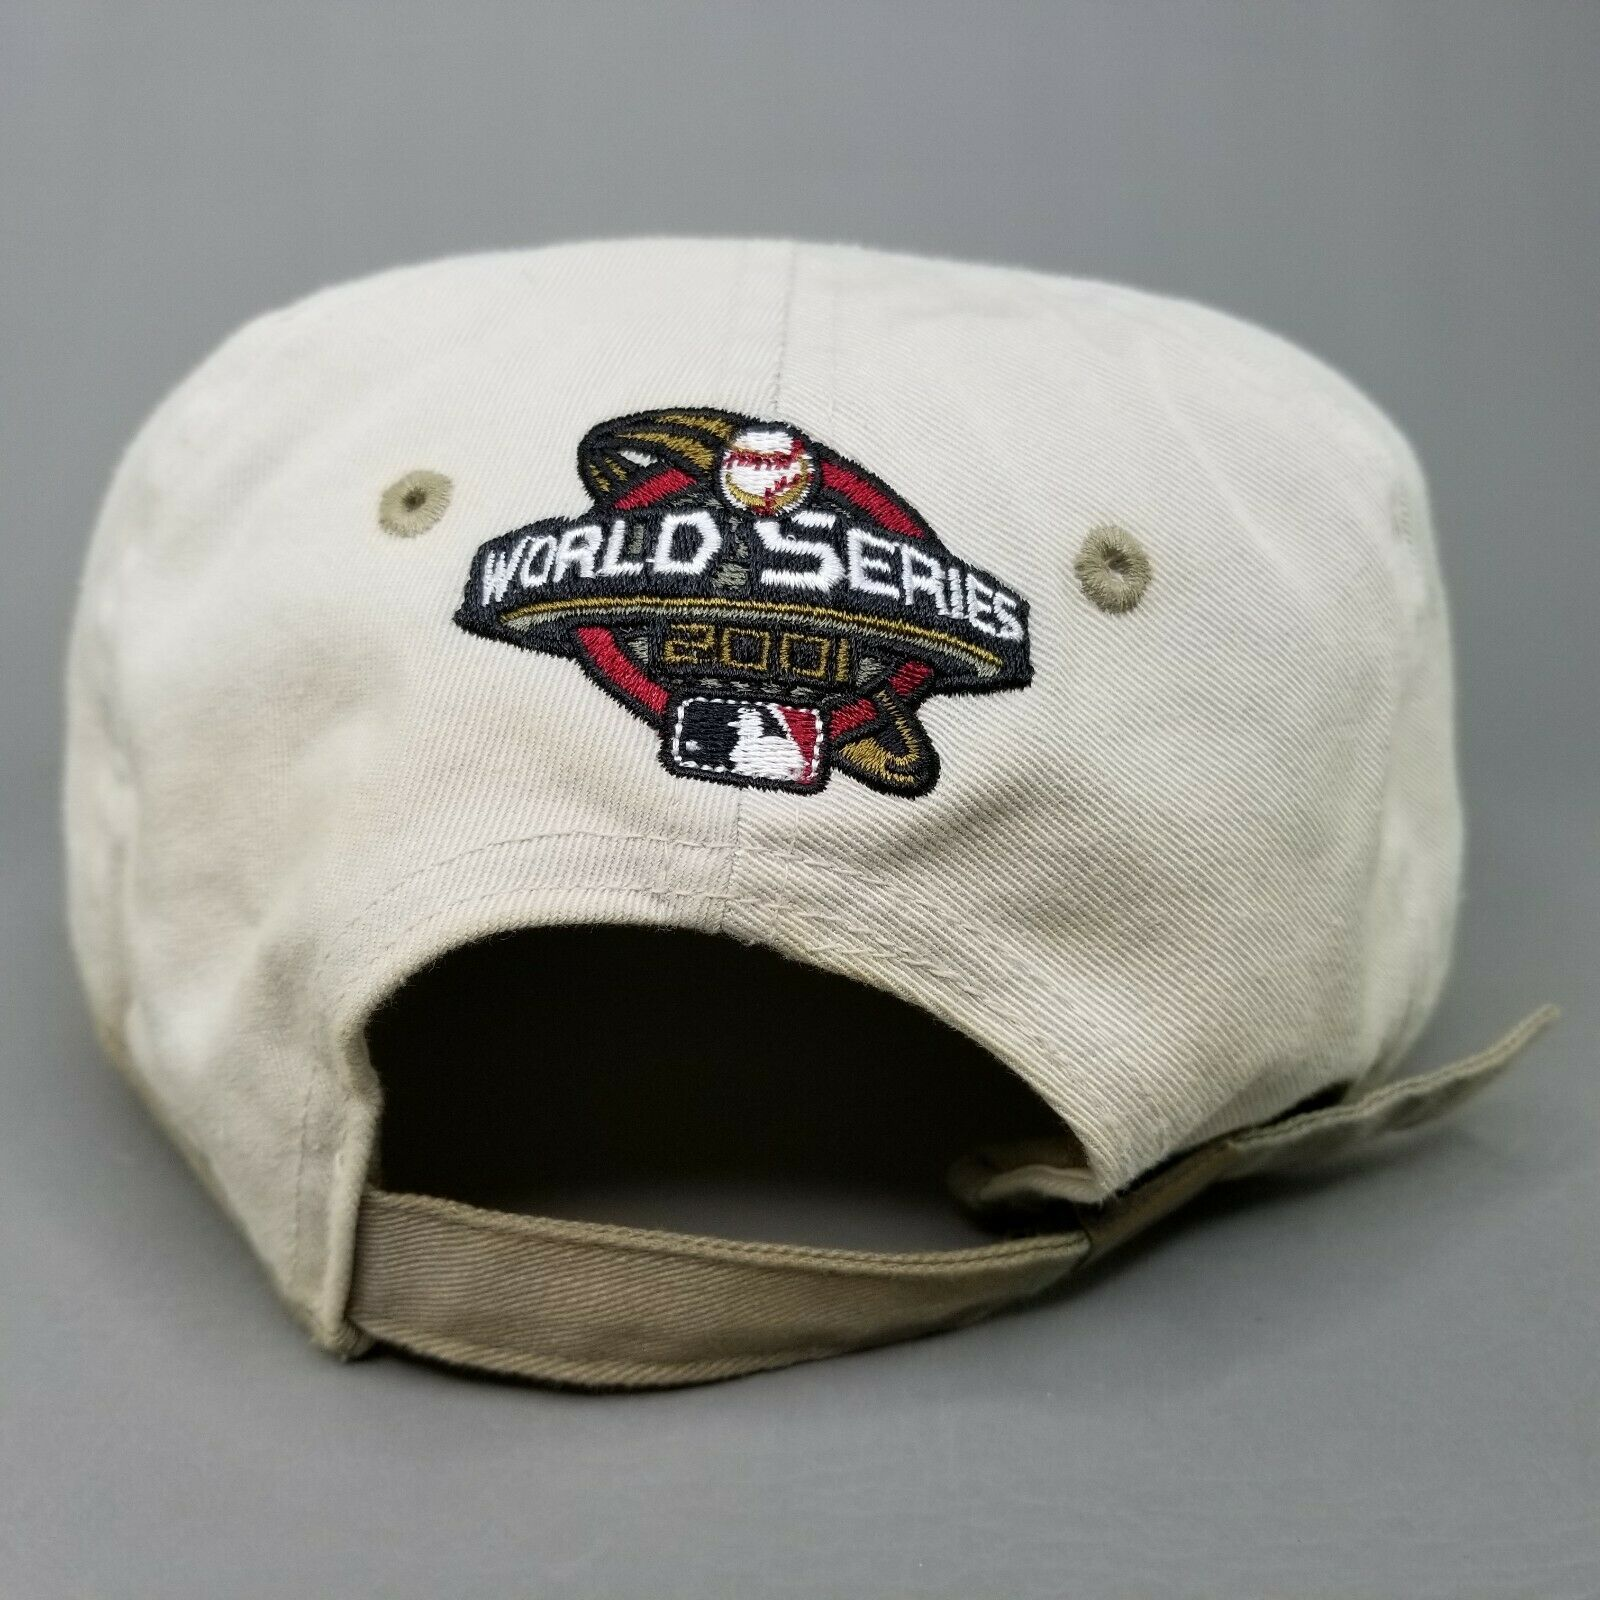 Arizona Diamondbacks New Era Baseball Hat 2001 League Champions World Series image 3